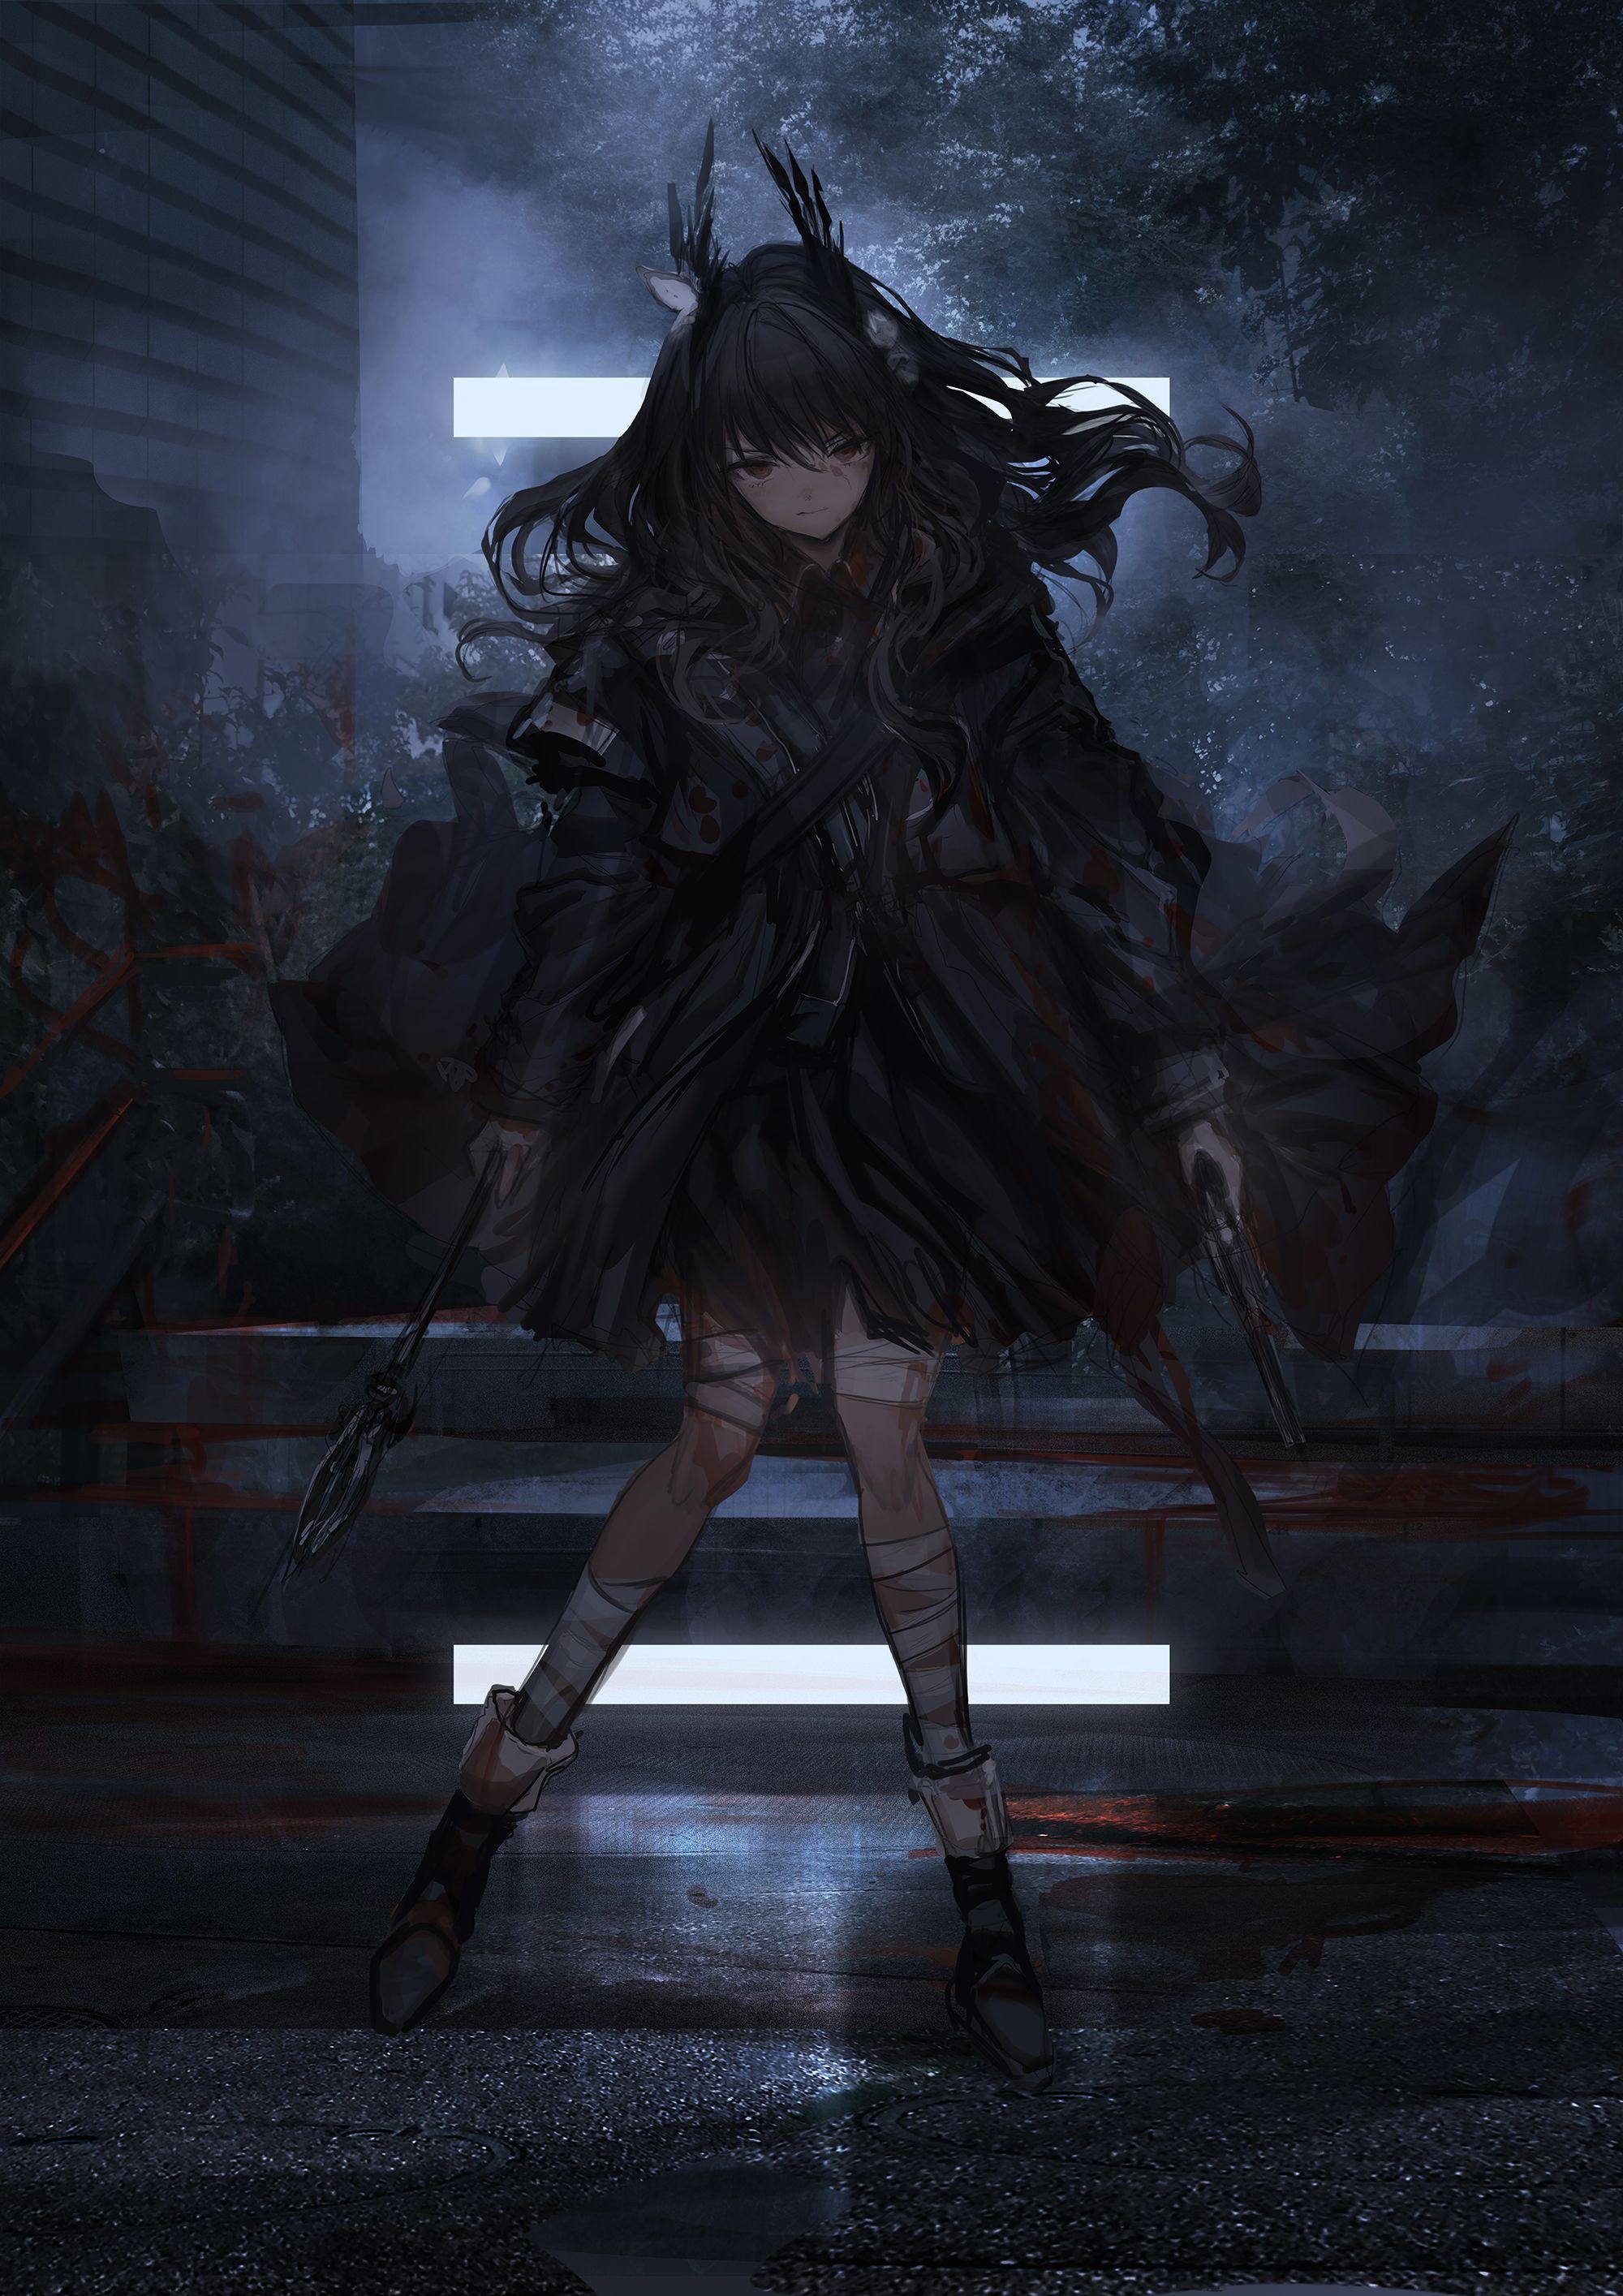 Anime Gothic Wallpaper : anime, gothic, wallpaper, Anime, Gothic, Wallpapers, Backgrounds, WallpaperAccess